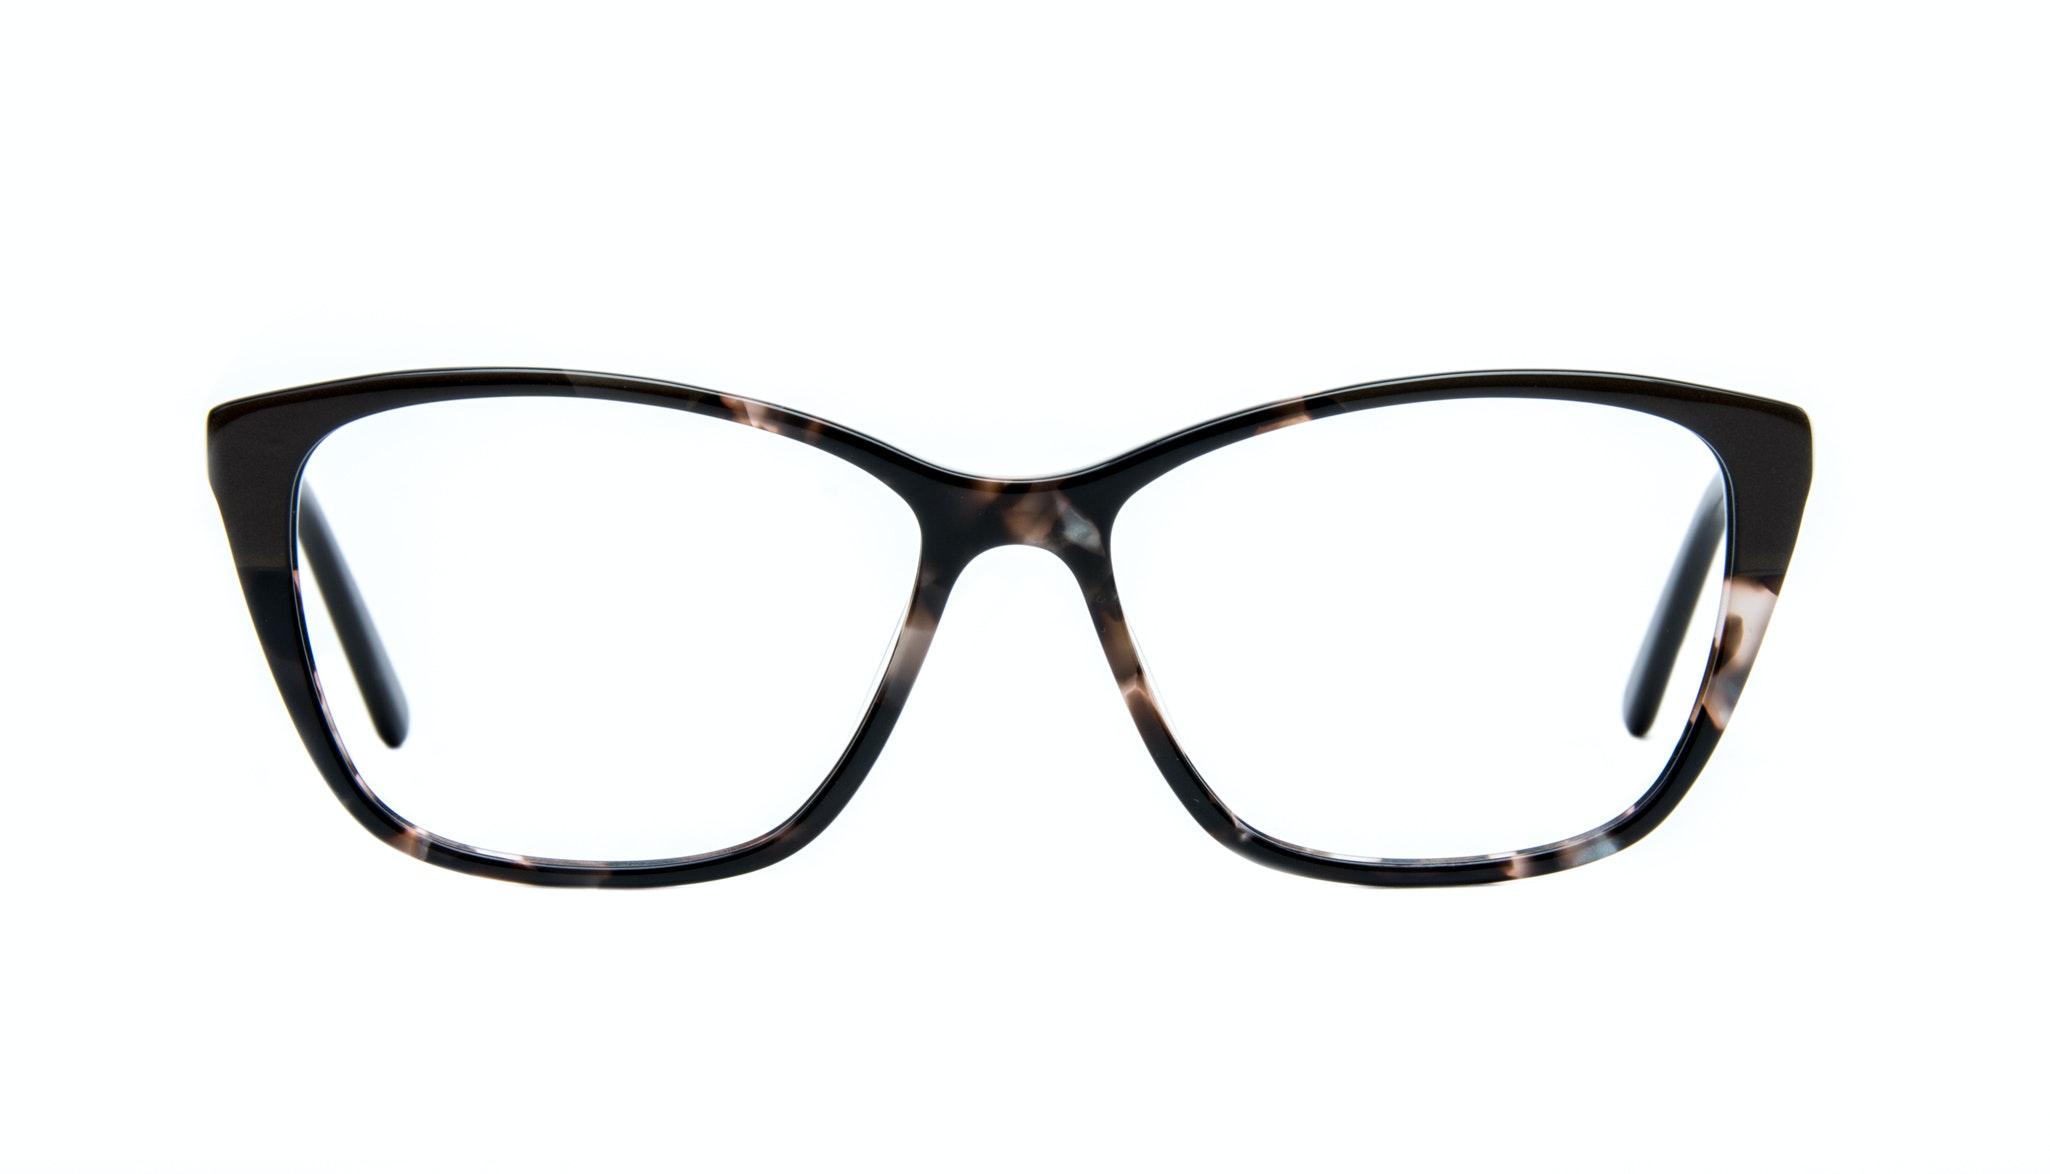 Affordable Fashion Glasses Cat Eye Rectangle Eyeglasses Women Myrtle Grey Stone